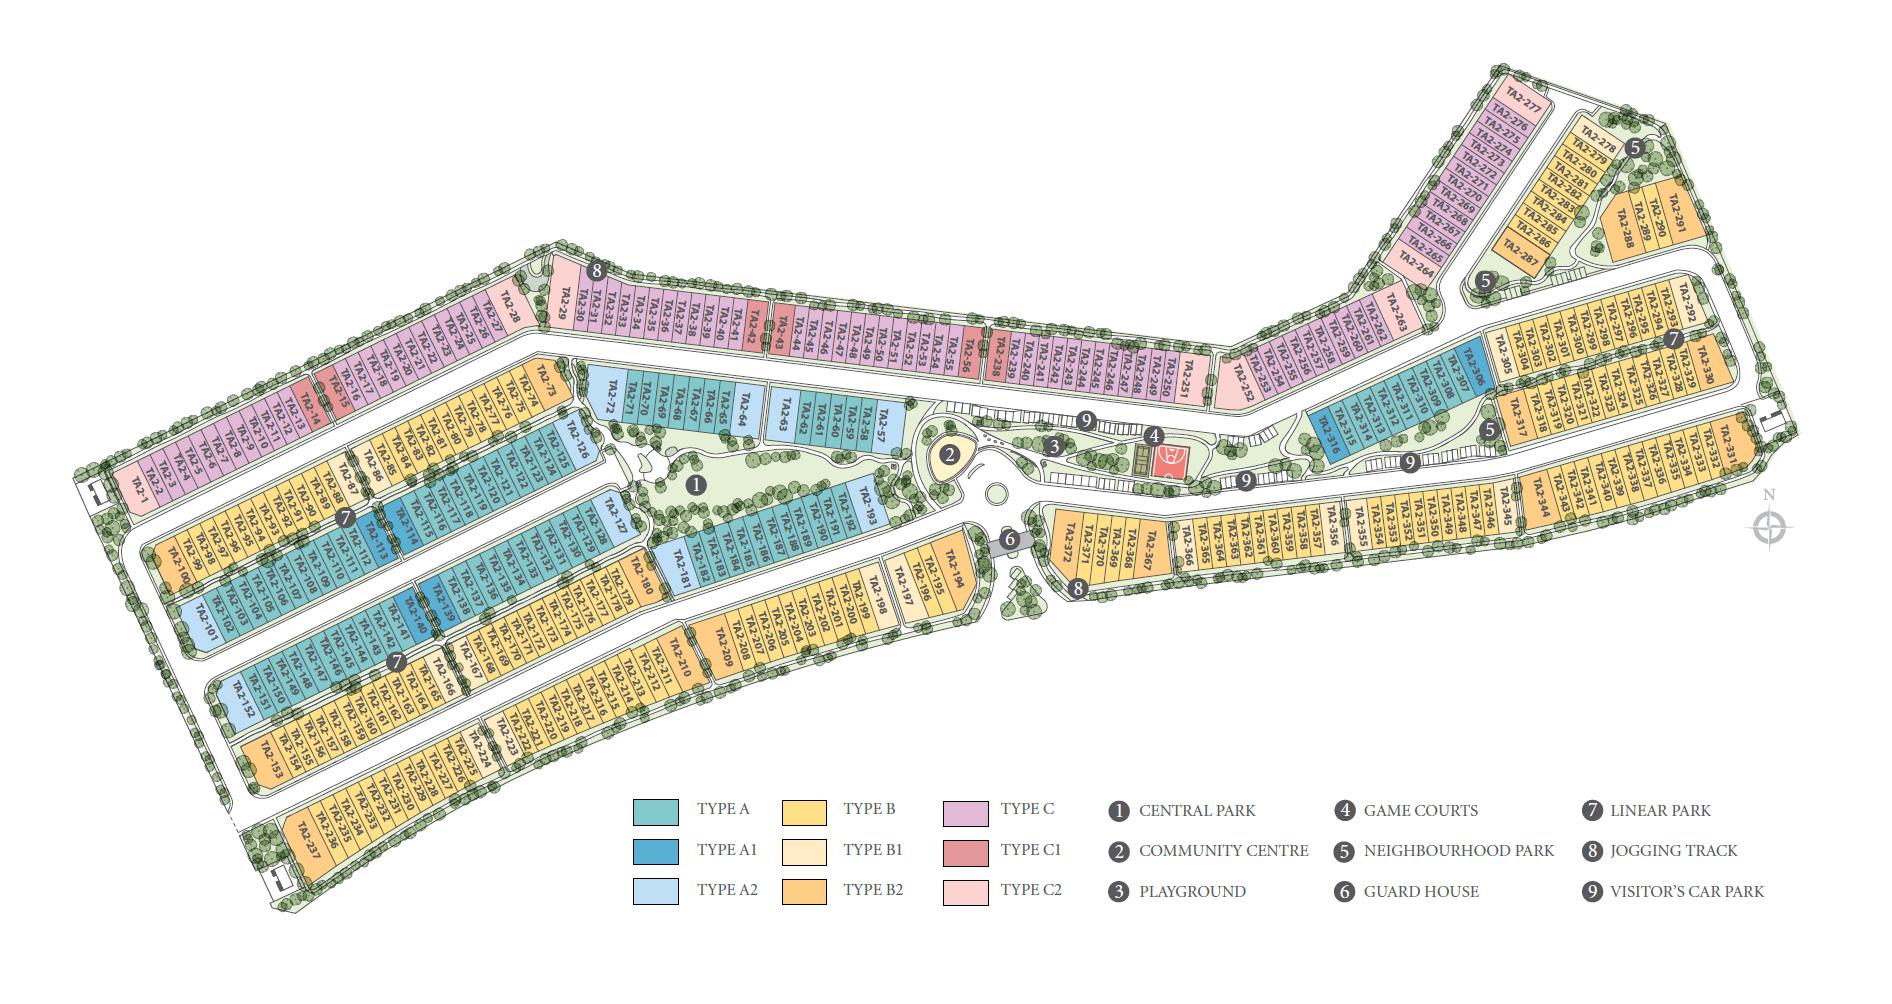 Site Plan of Bayan